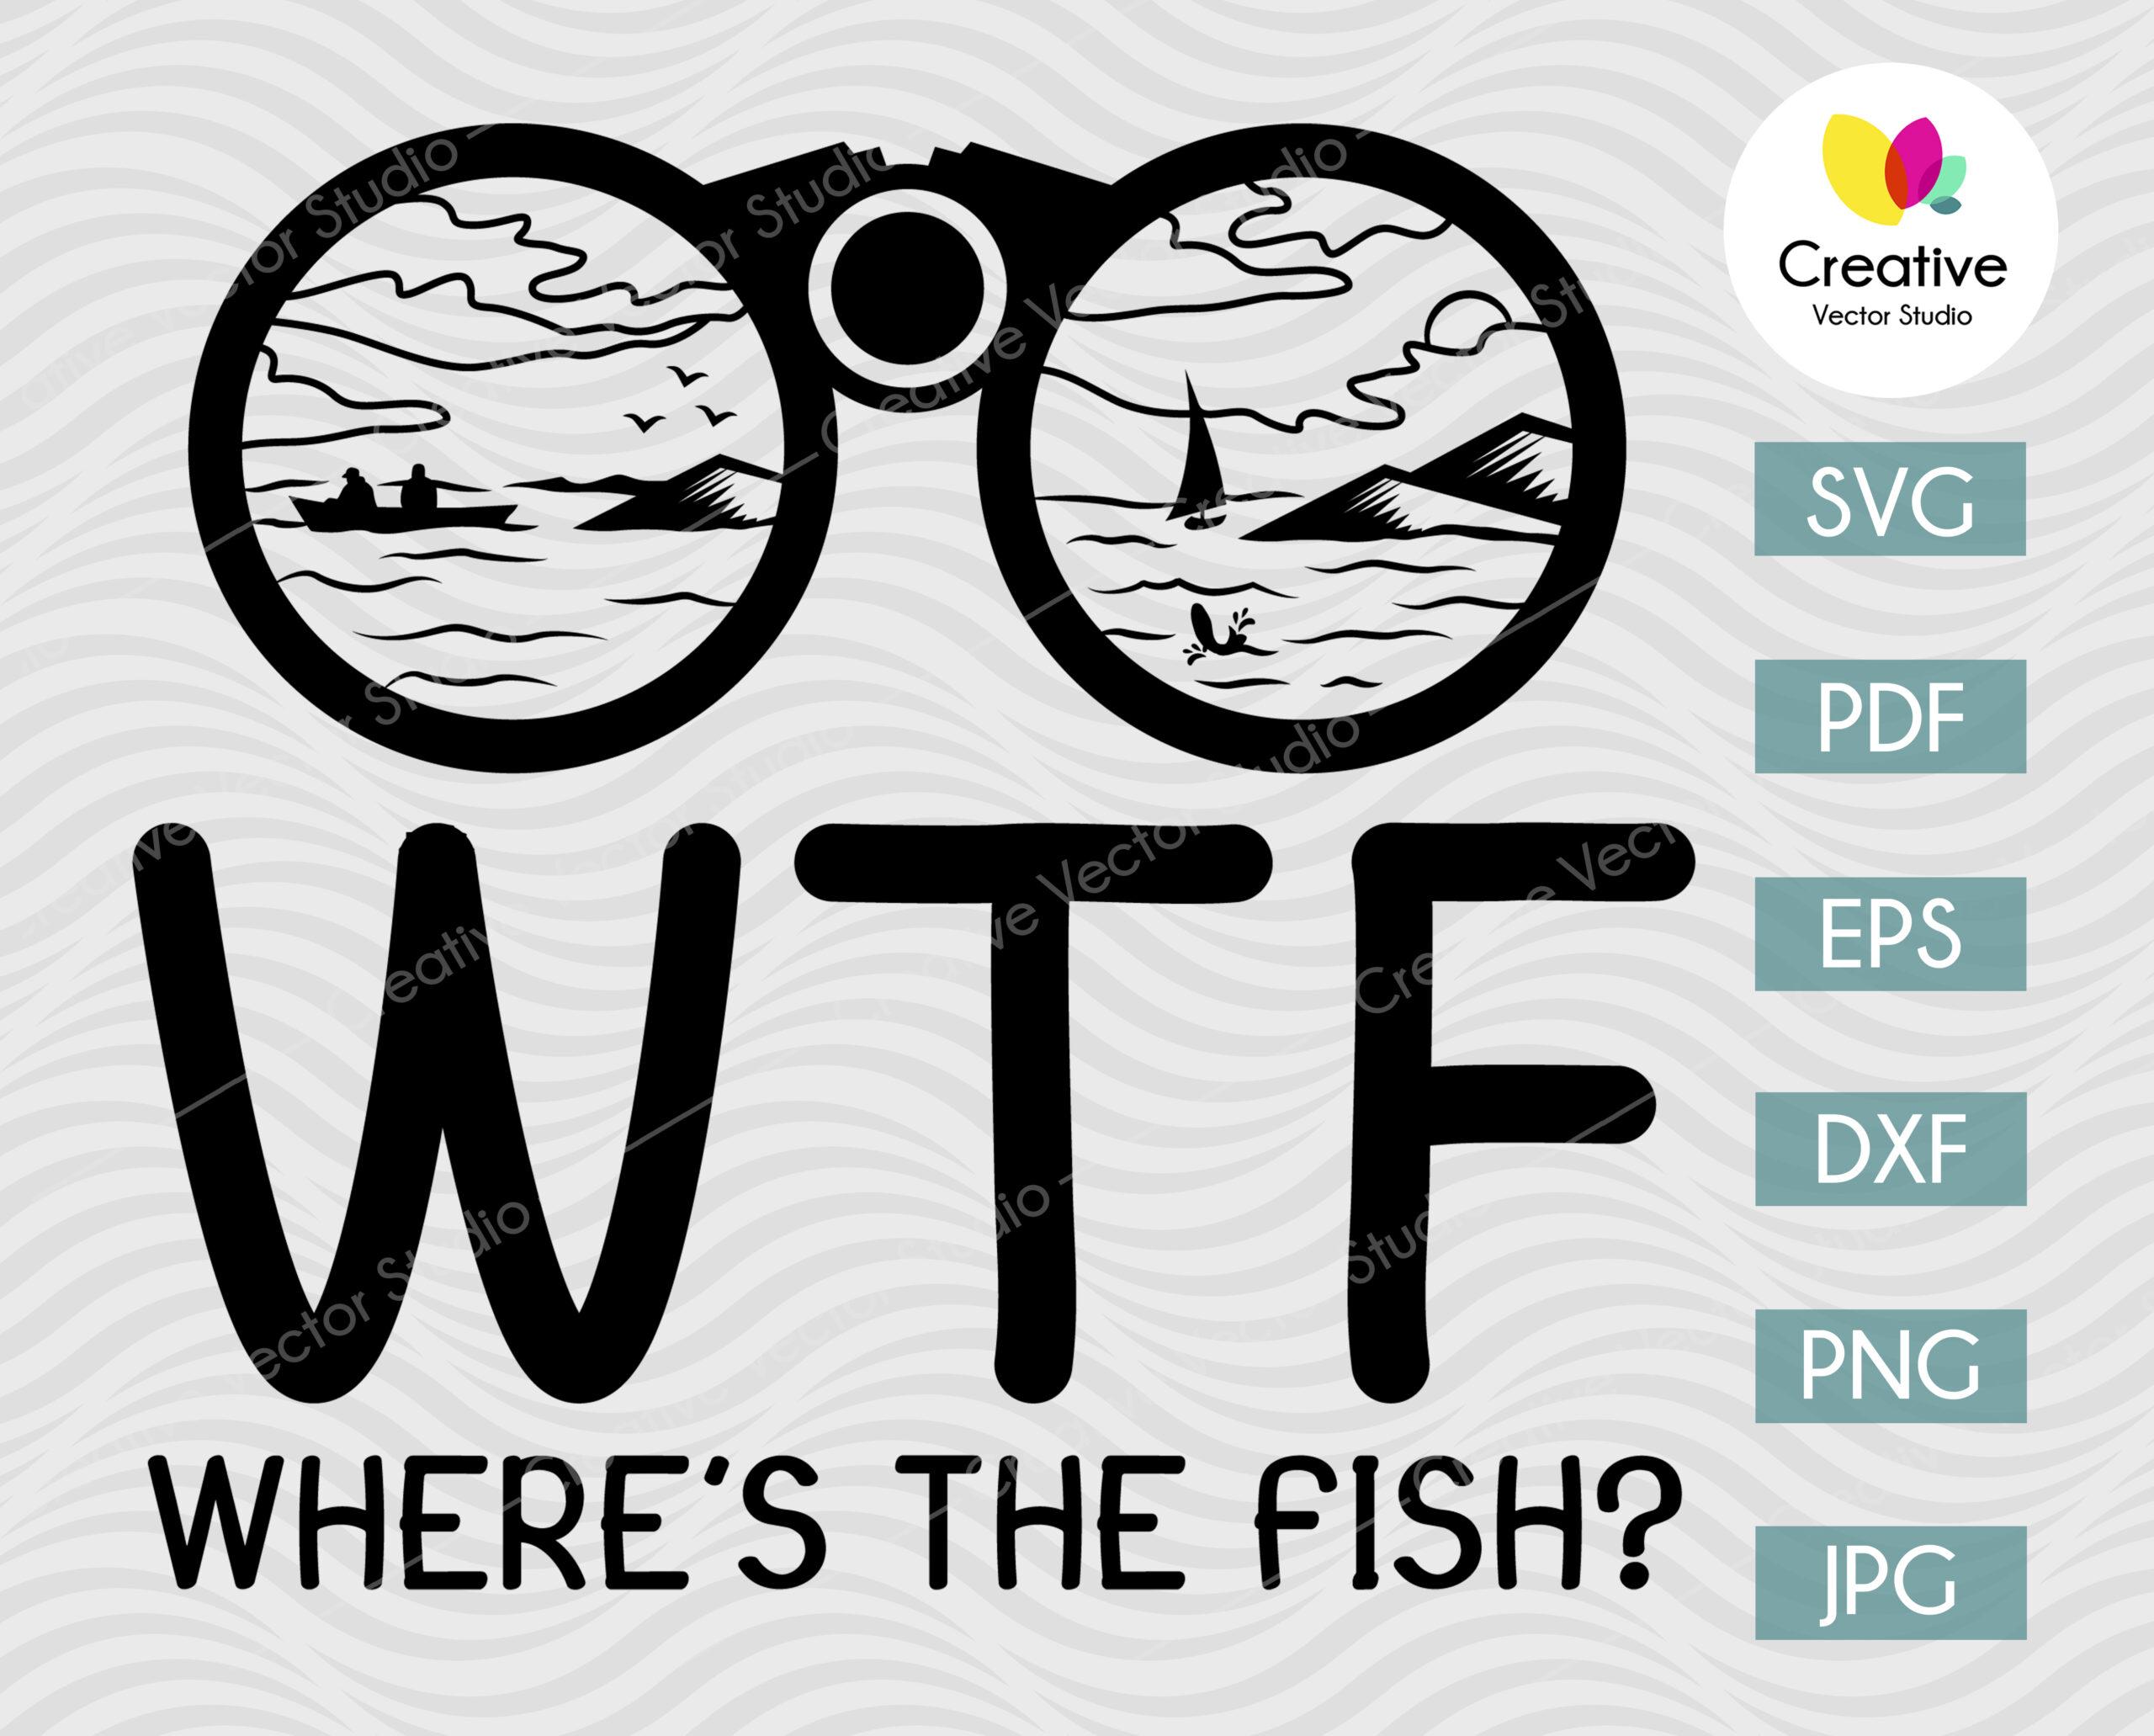 Download Wtf Where S The Fish Svg Creative Vector Studio